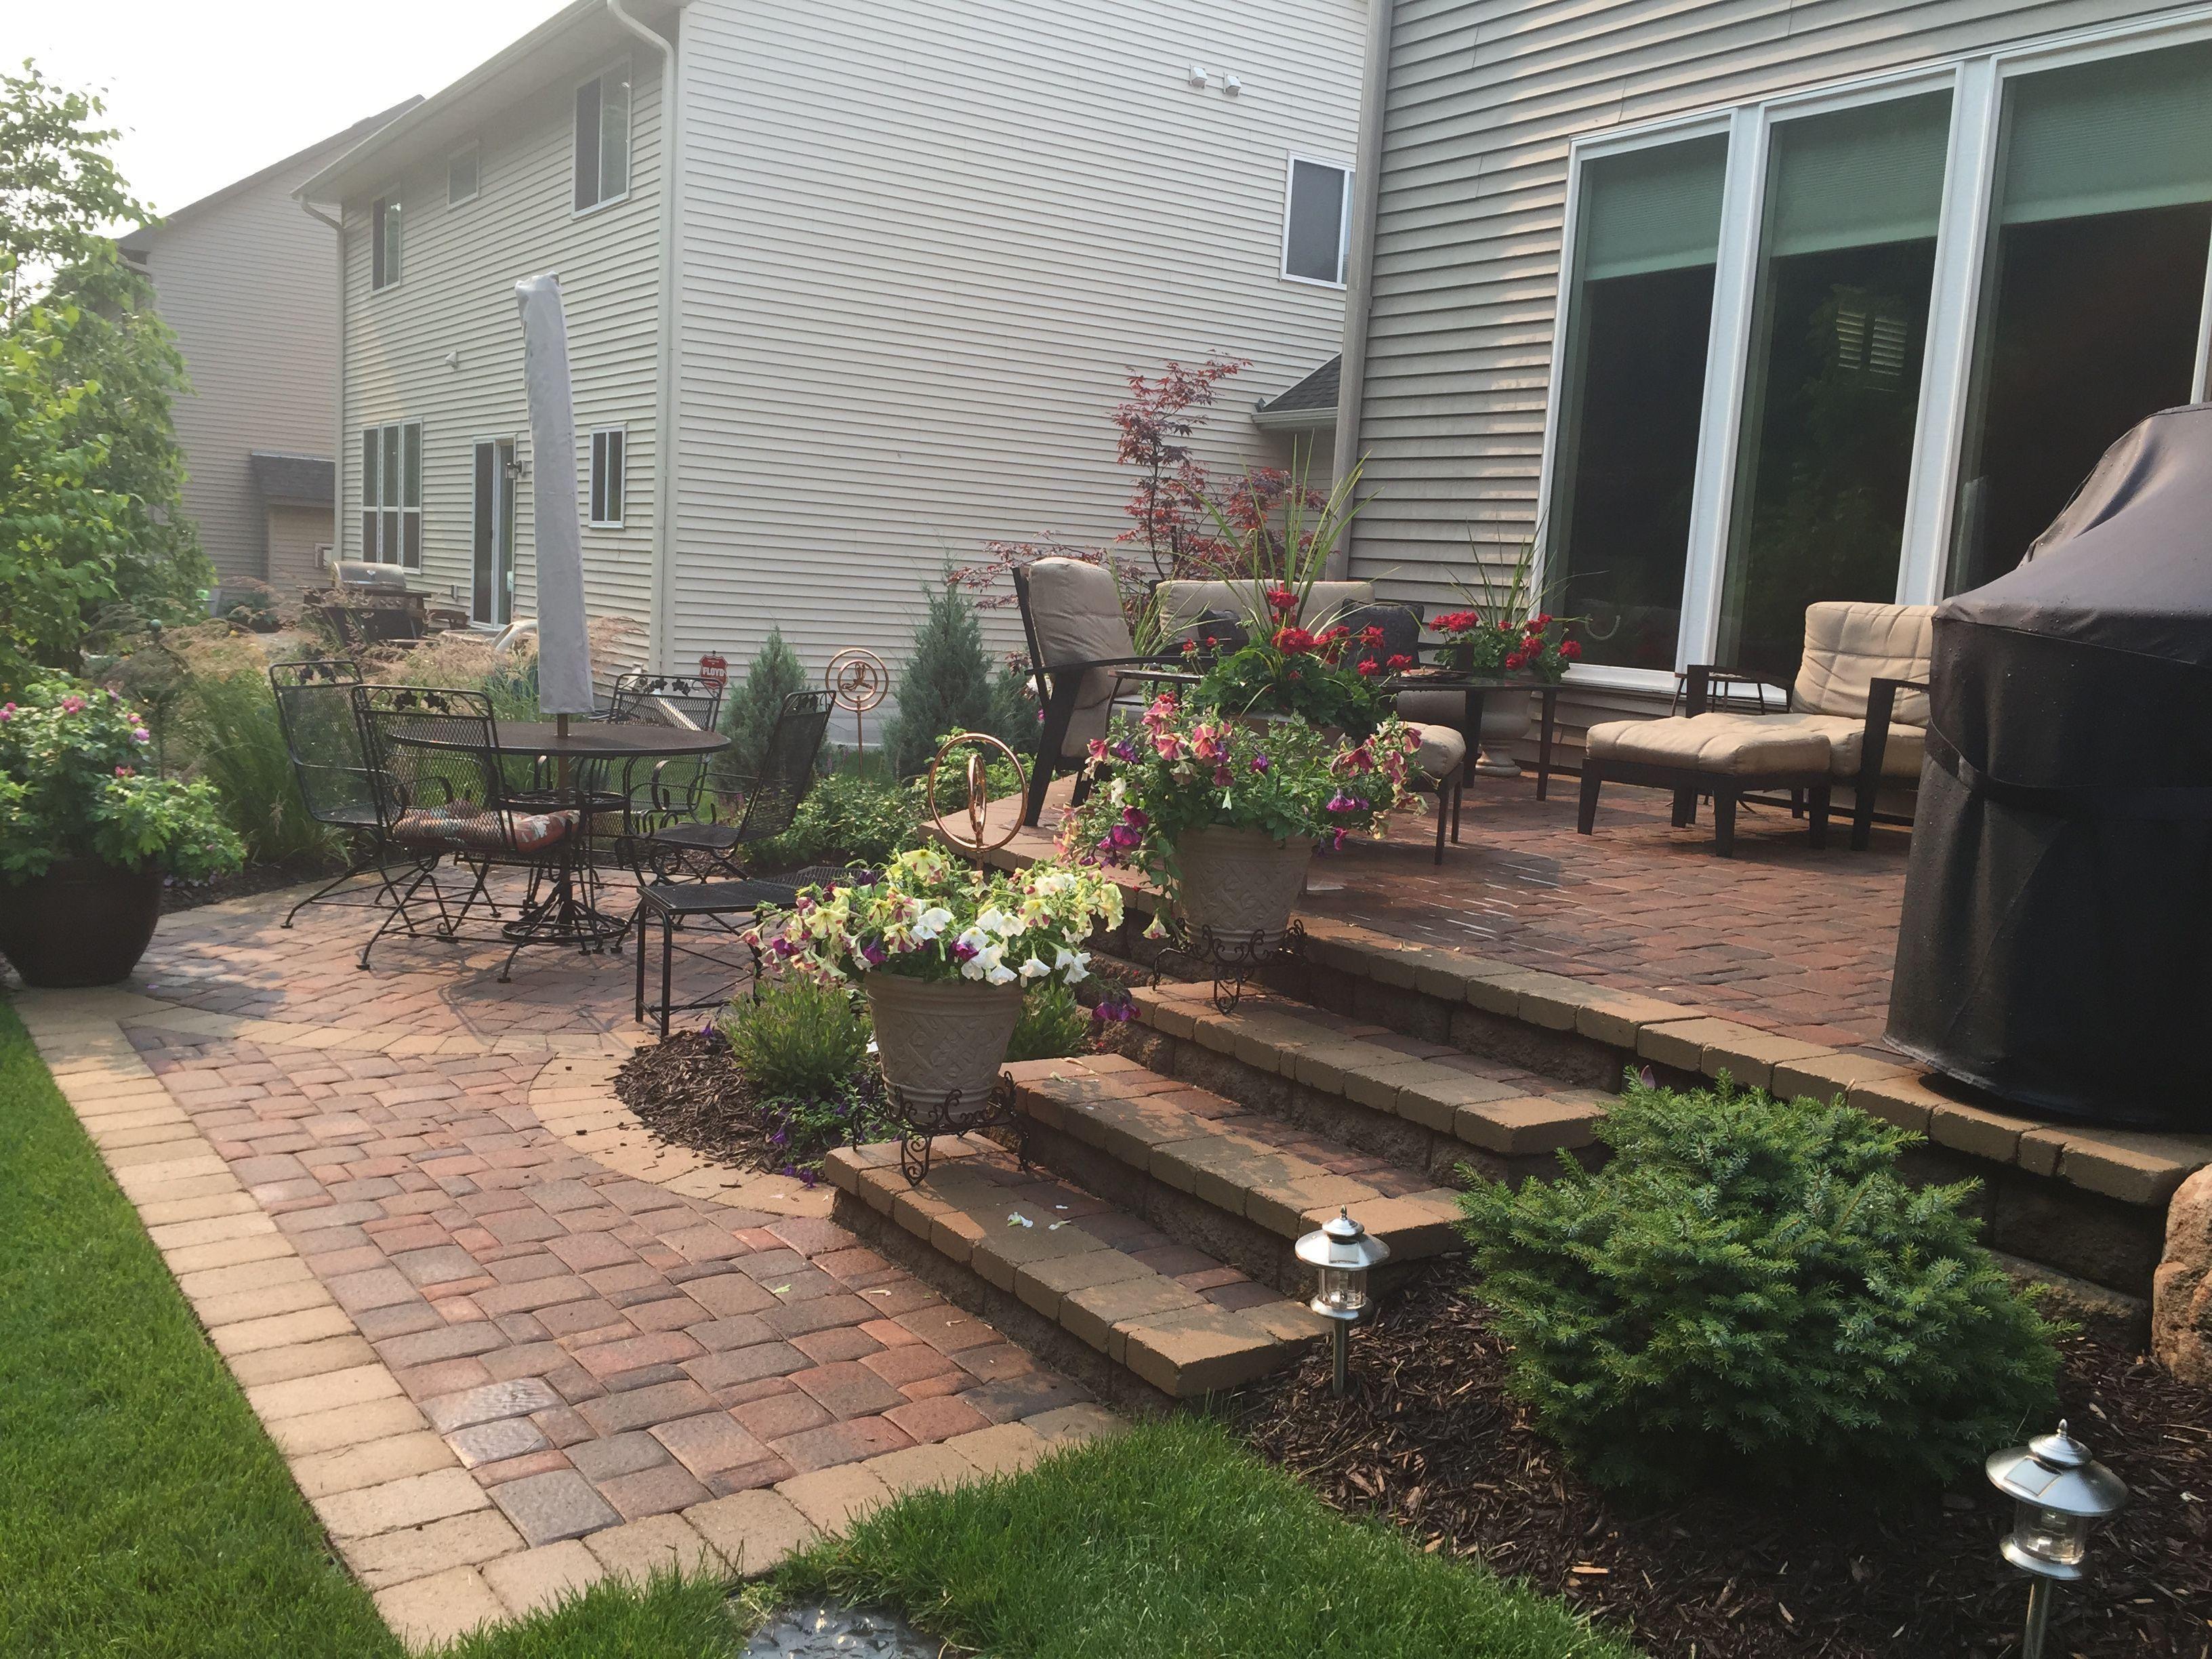 Backyard porch ideas on a budget patio makeover outdoor ... on Raised Garden Patio Ideas id=88569